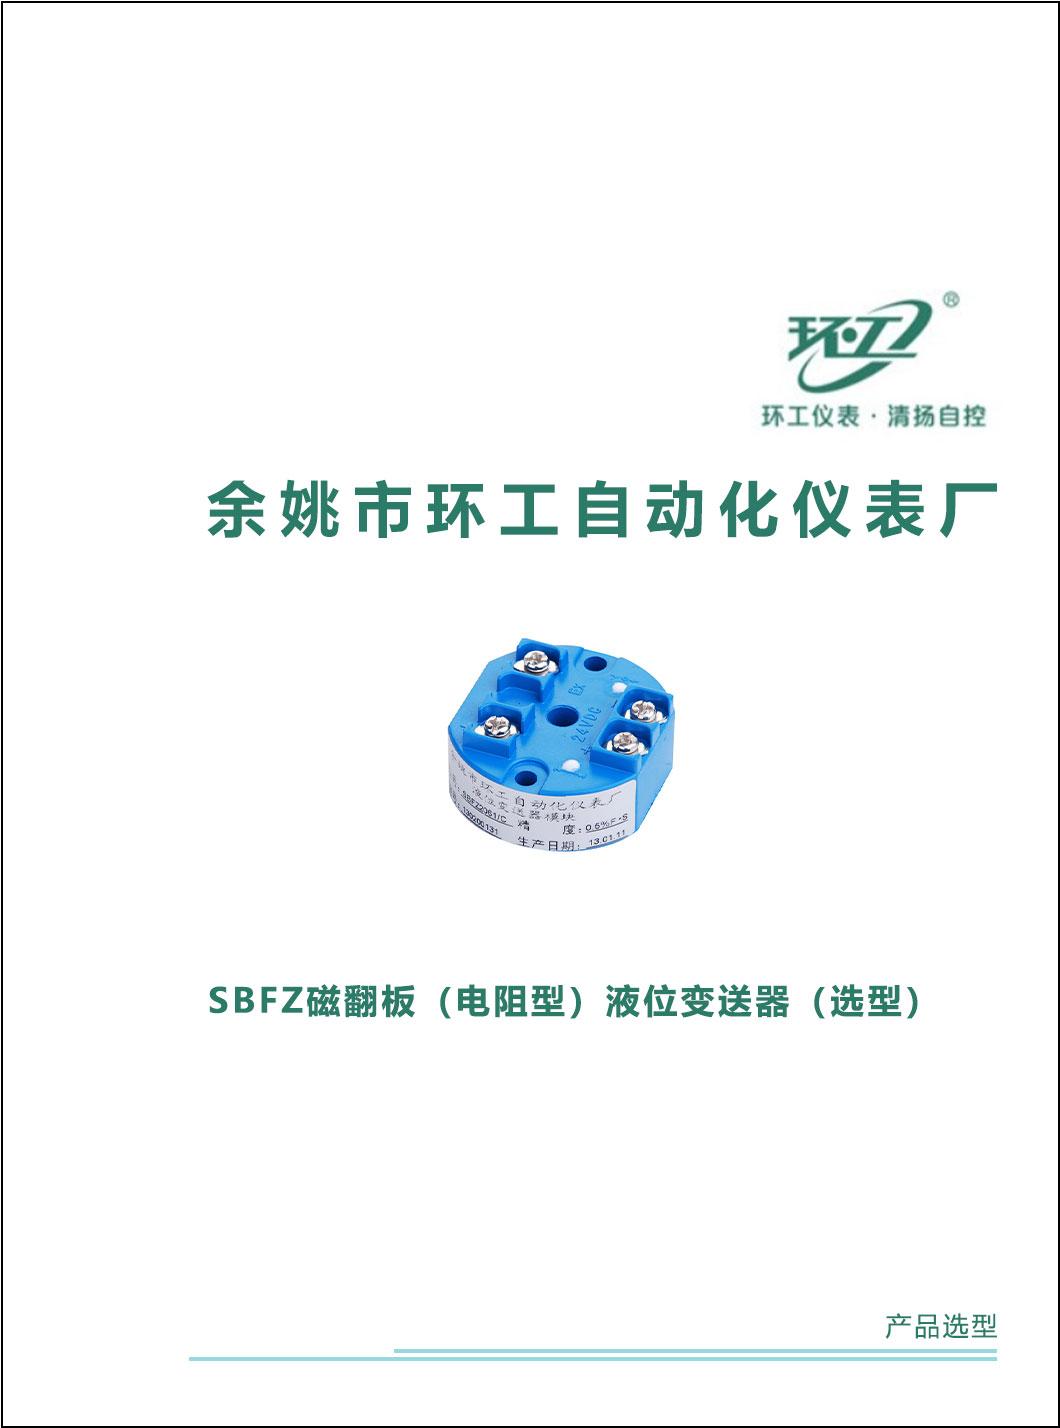 SBFZ磁翻板(电阻型)液位变送器-环工仪表-清扬自控